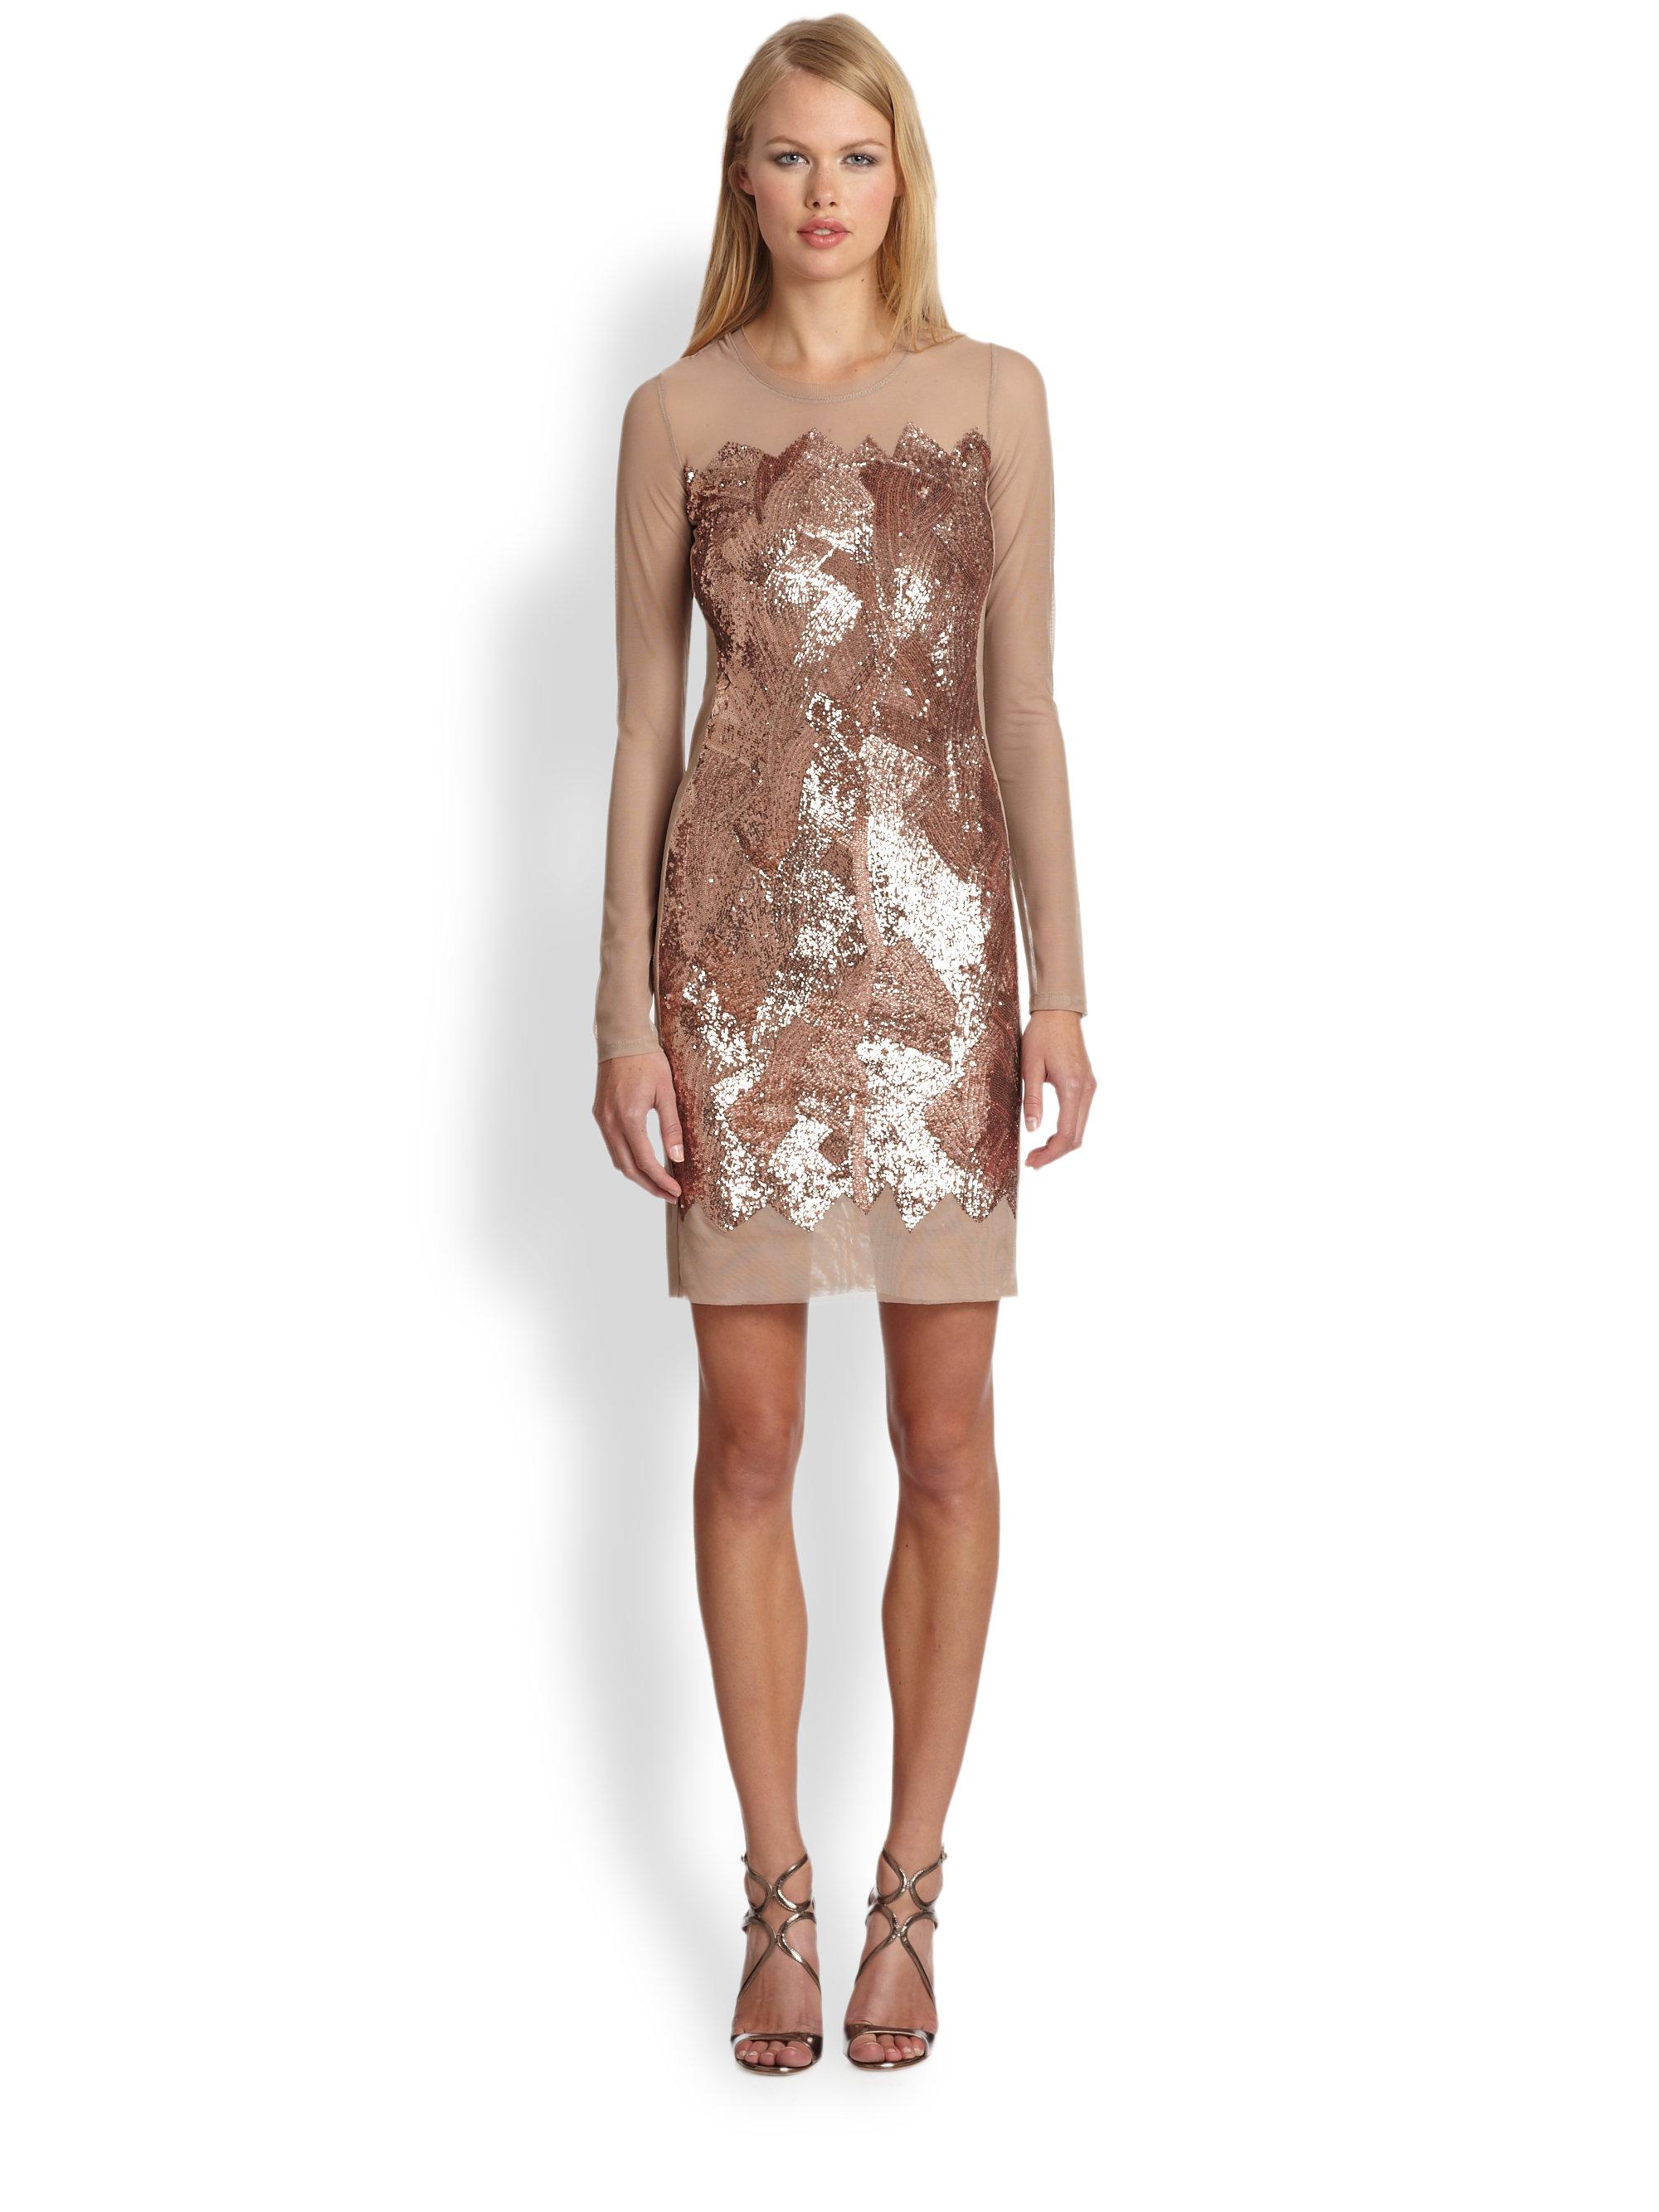 Bcbgmaxazria Anaya Beaded Sequin Dress in Natural | Lyst